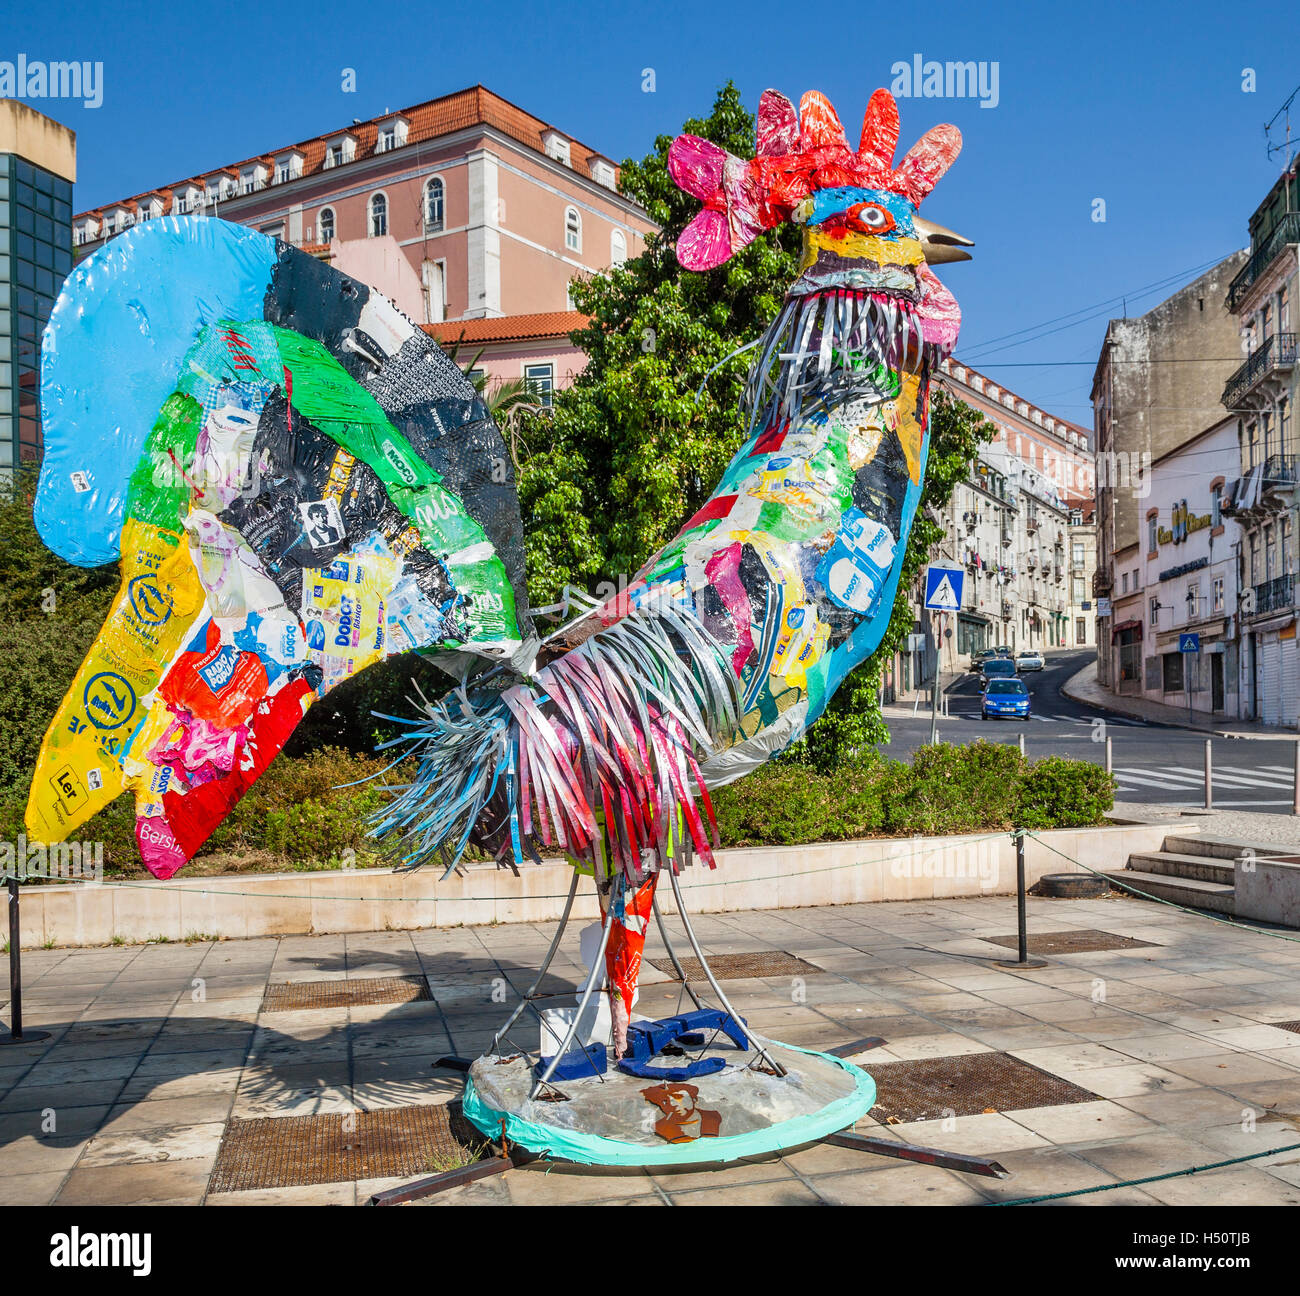 rooster collage sculpture instalation at Largo Martim Moniz, Lisbon, Portugal. The Rooster of Barcelos is an emblem - Stock Image